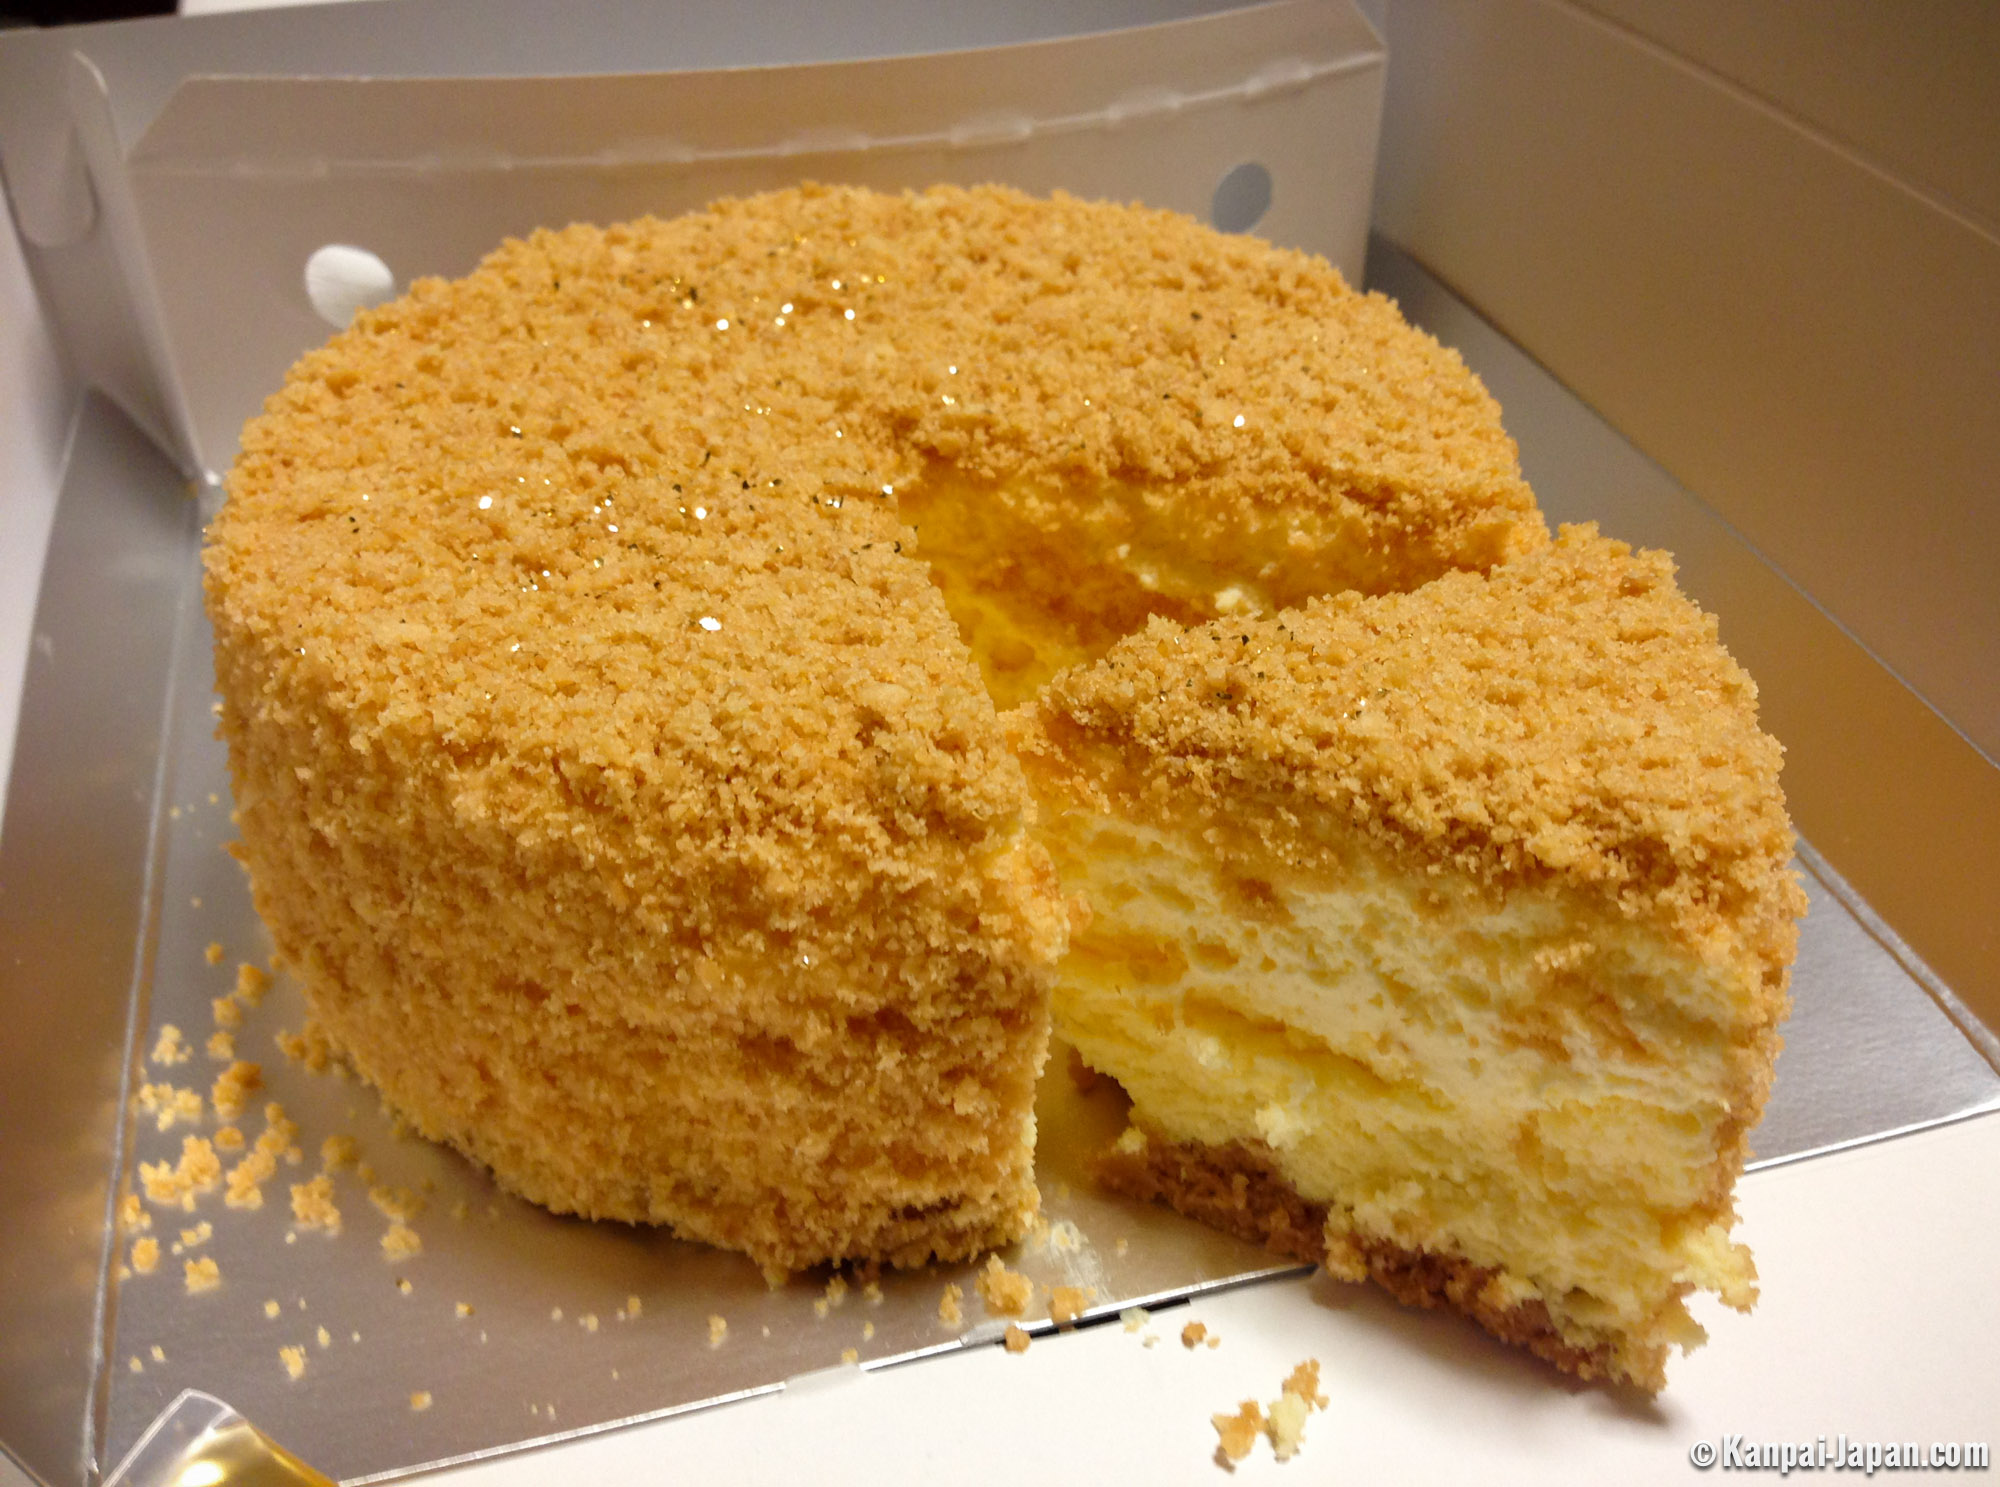 Japanese Cakes Kawaii And Yummy